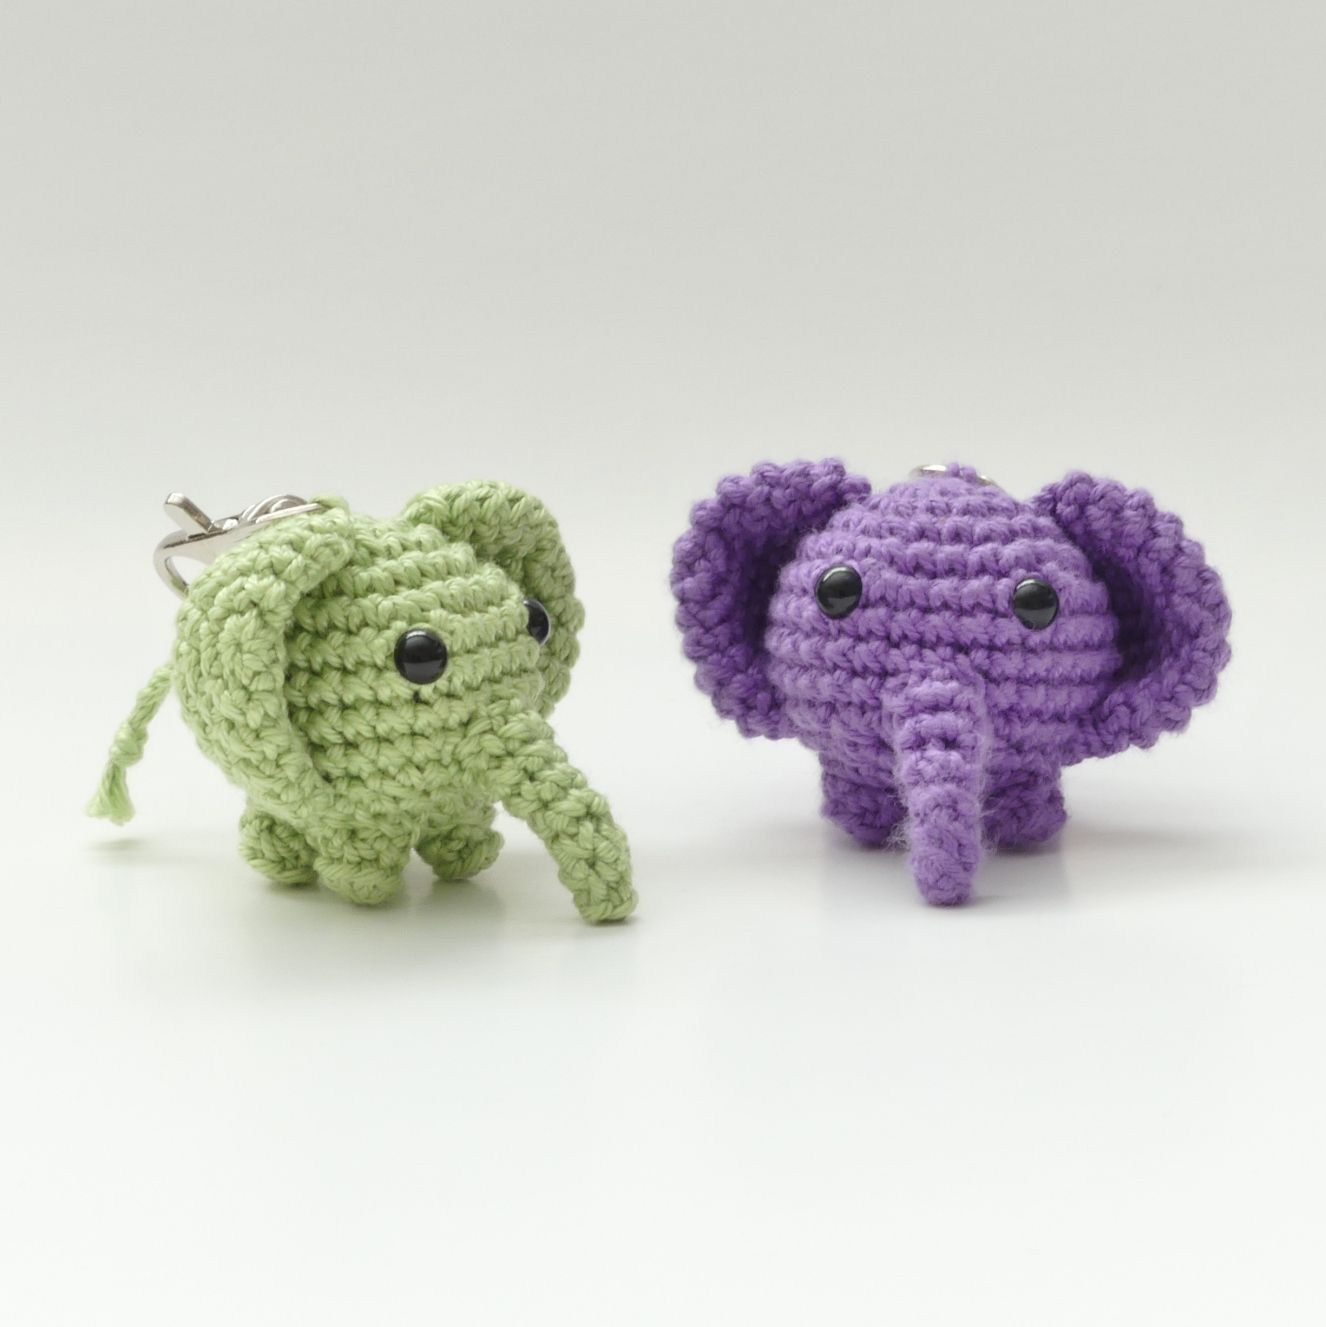 Free Crochet Elephant Pattern Amigurumi Elephant Keychain Free Pattern Crochet Patterns #crochetelephantpattern